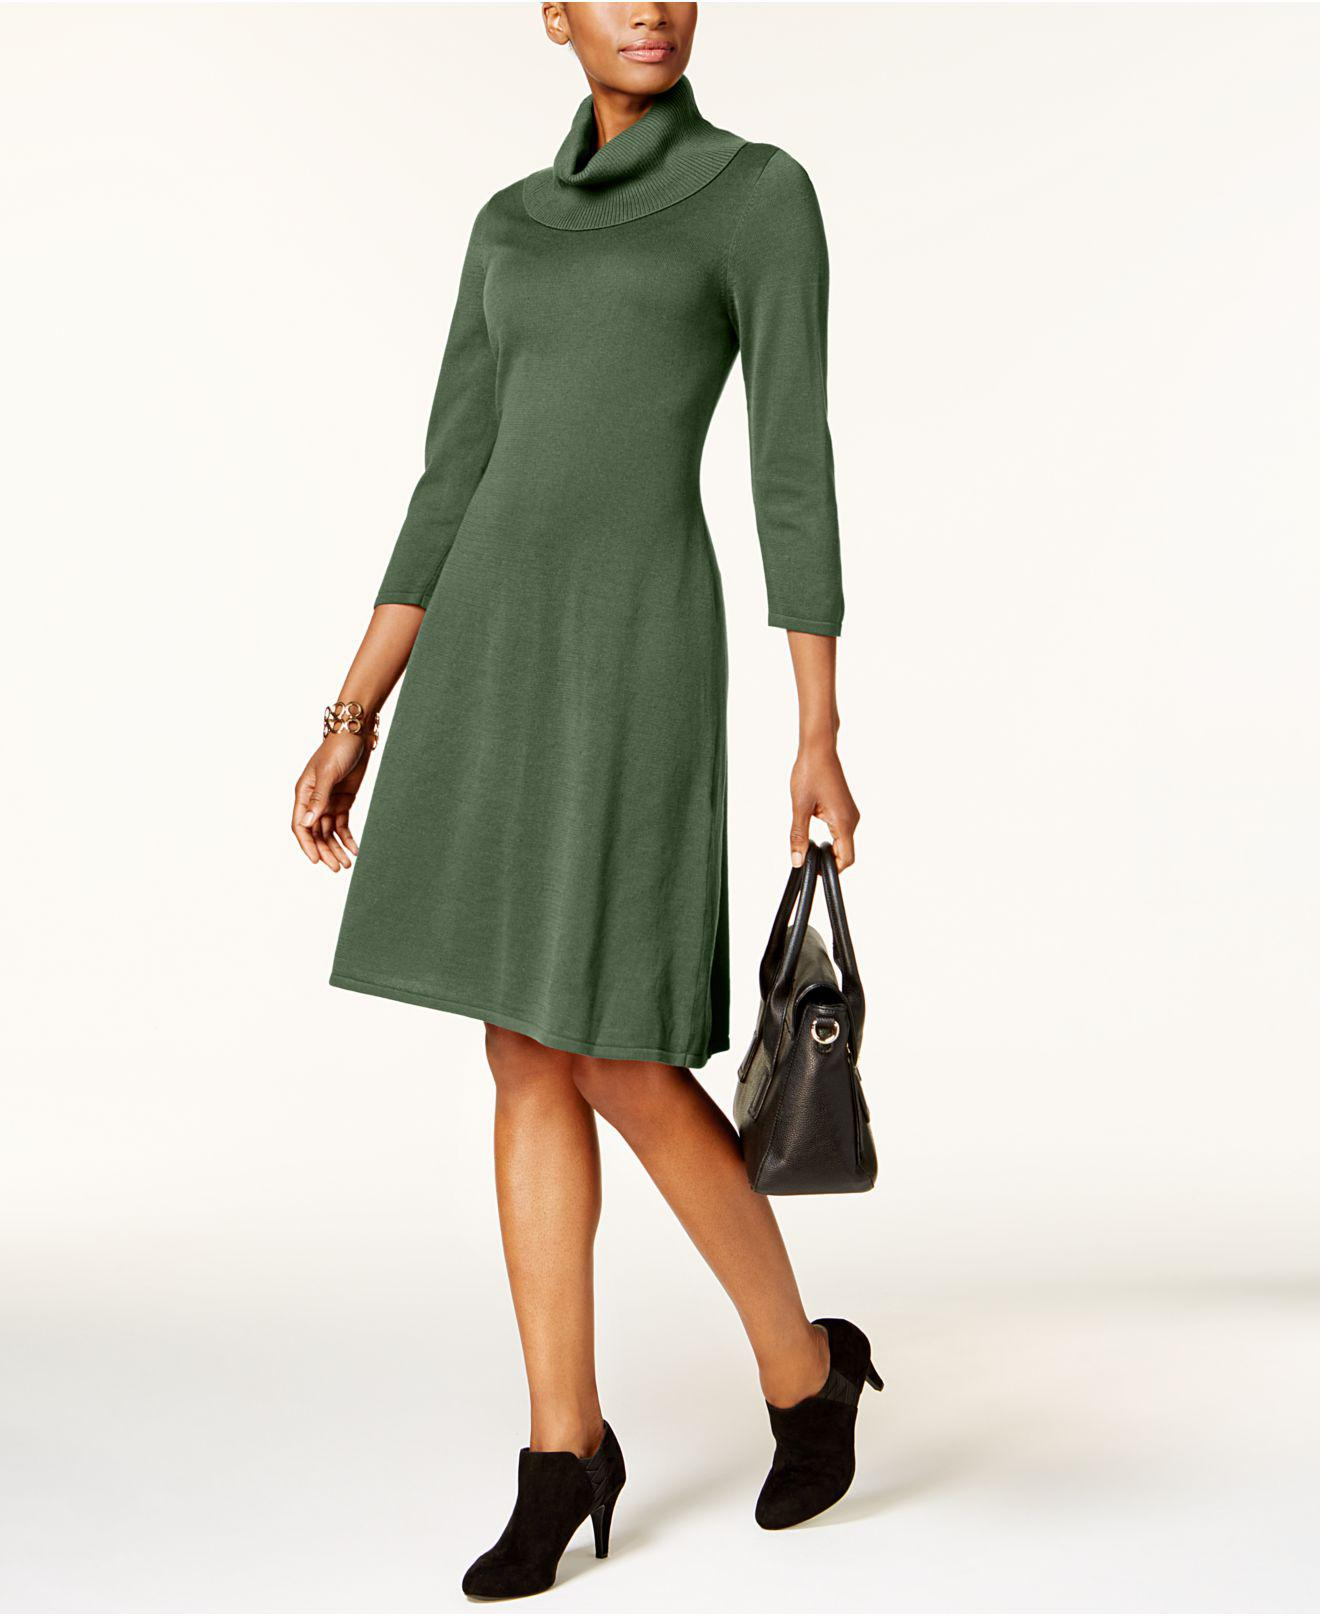 Nine west Cowl-neck Sweater Dress in Green | Lyst